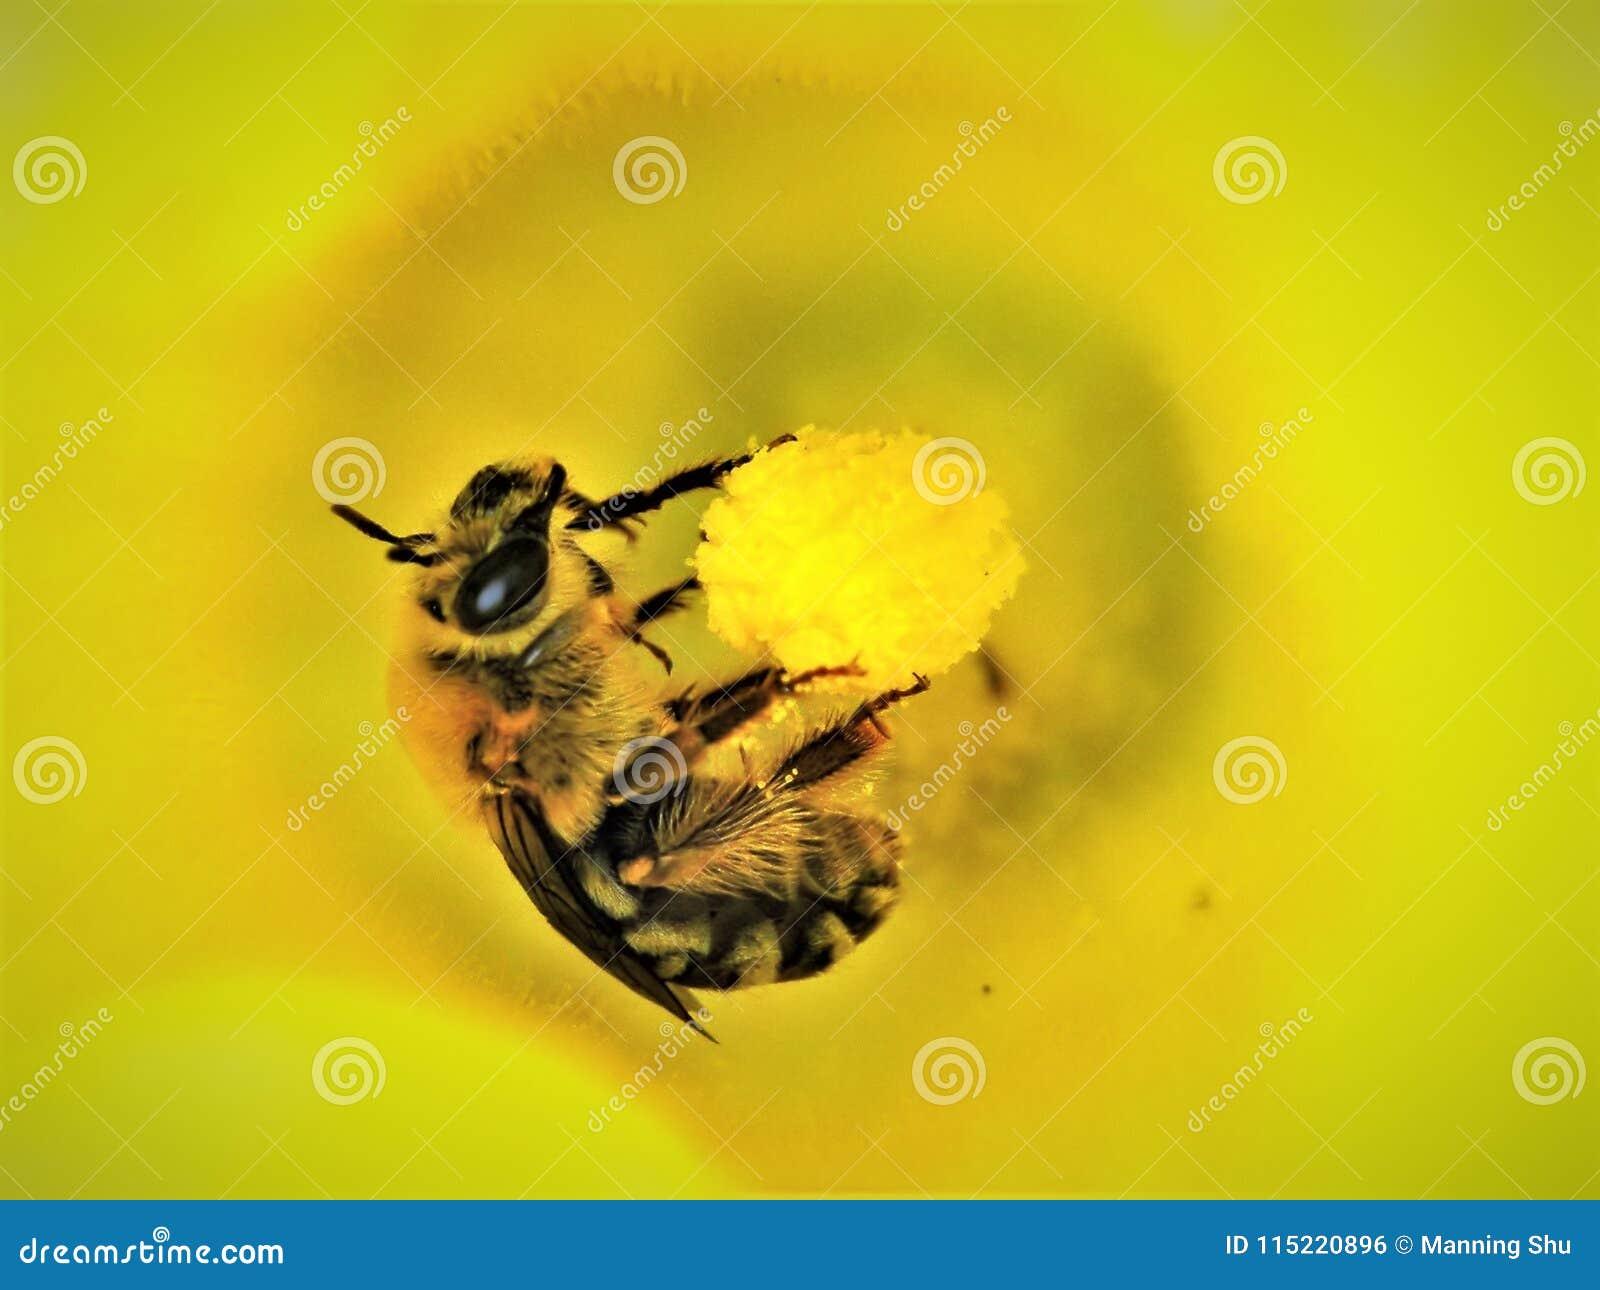 Bumble Bee on Pumpkin Flower Macro